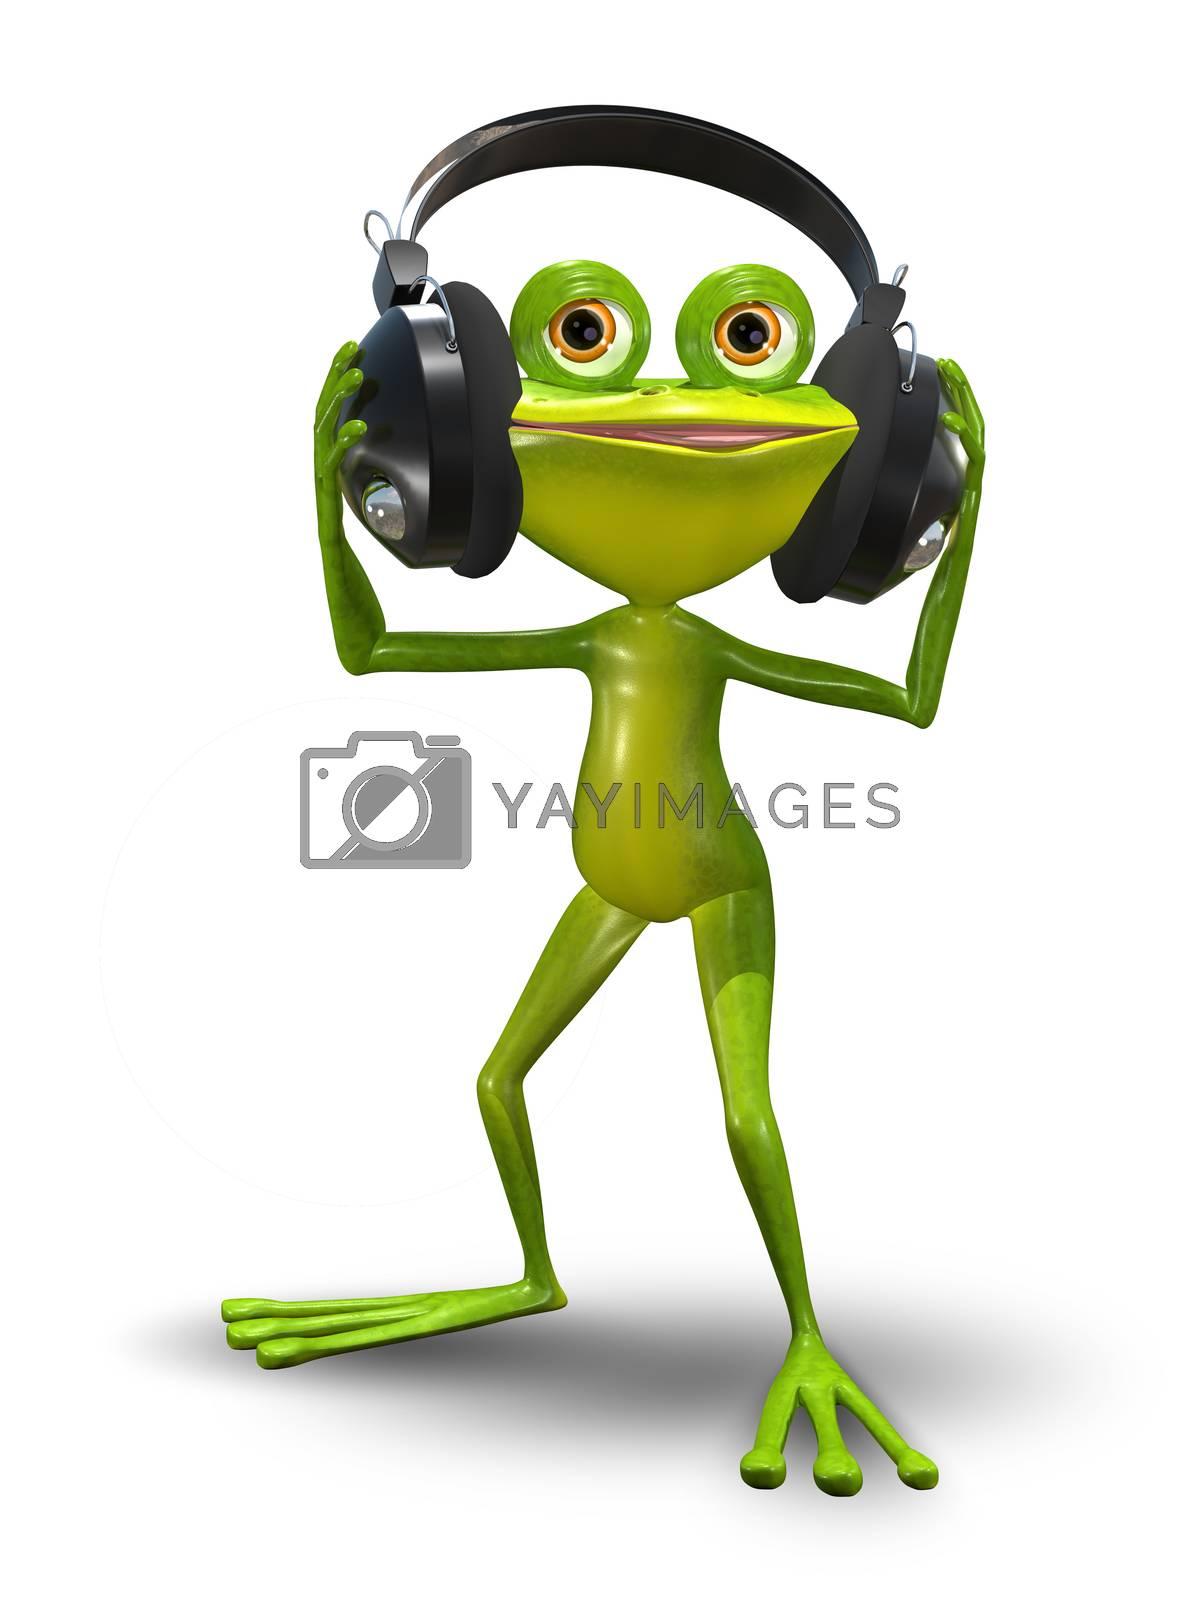 Illustration of a cartoon frog in headphones